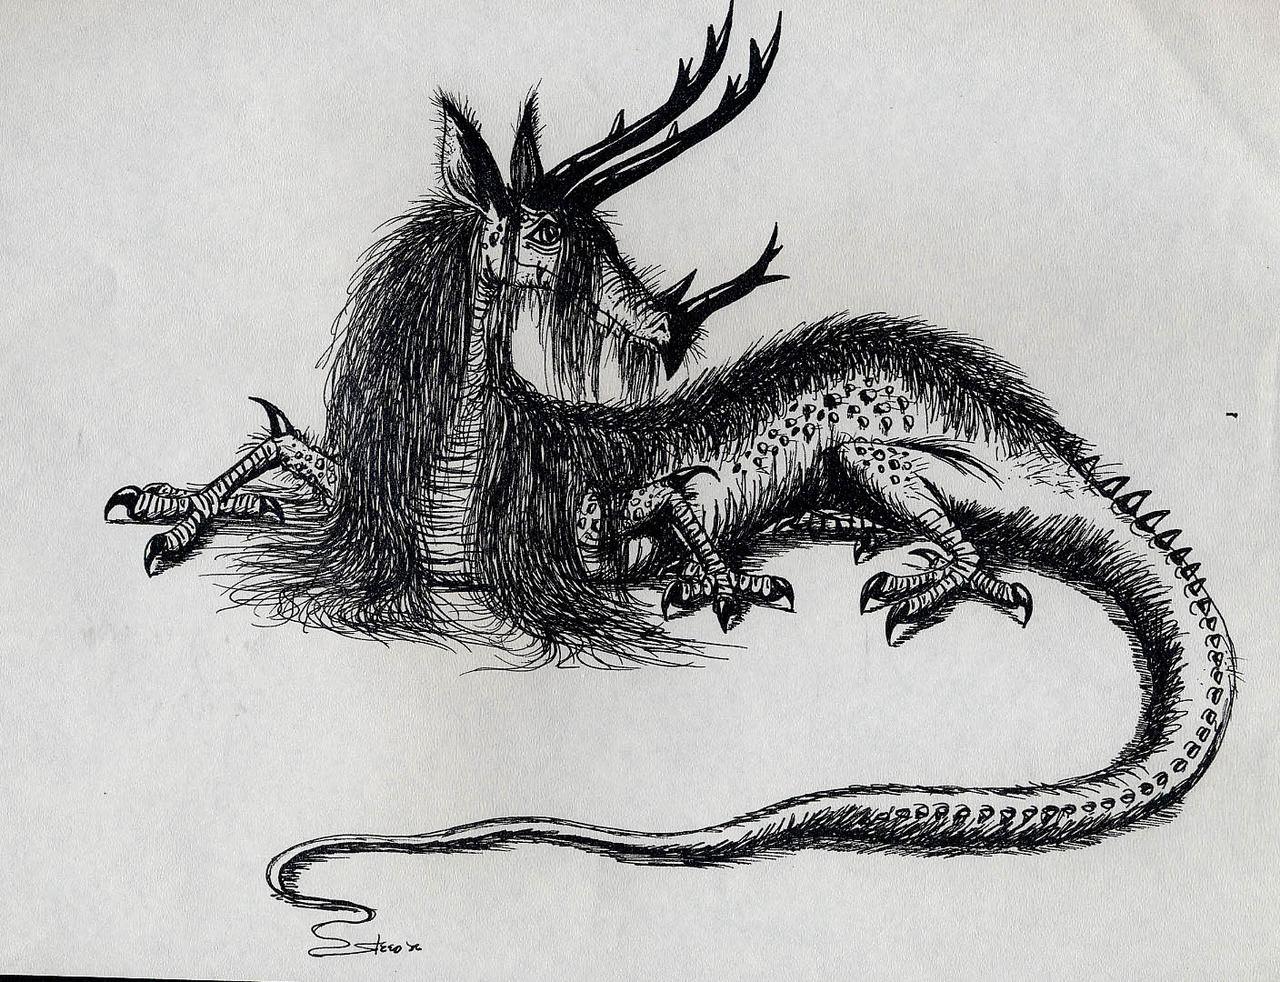 Realistic Dragon Drawings | Design Trends - Premium PSD ...